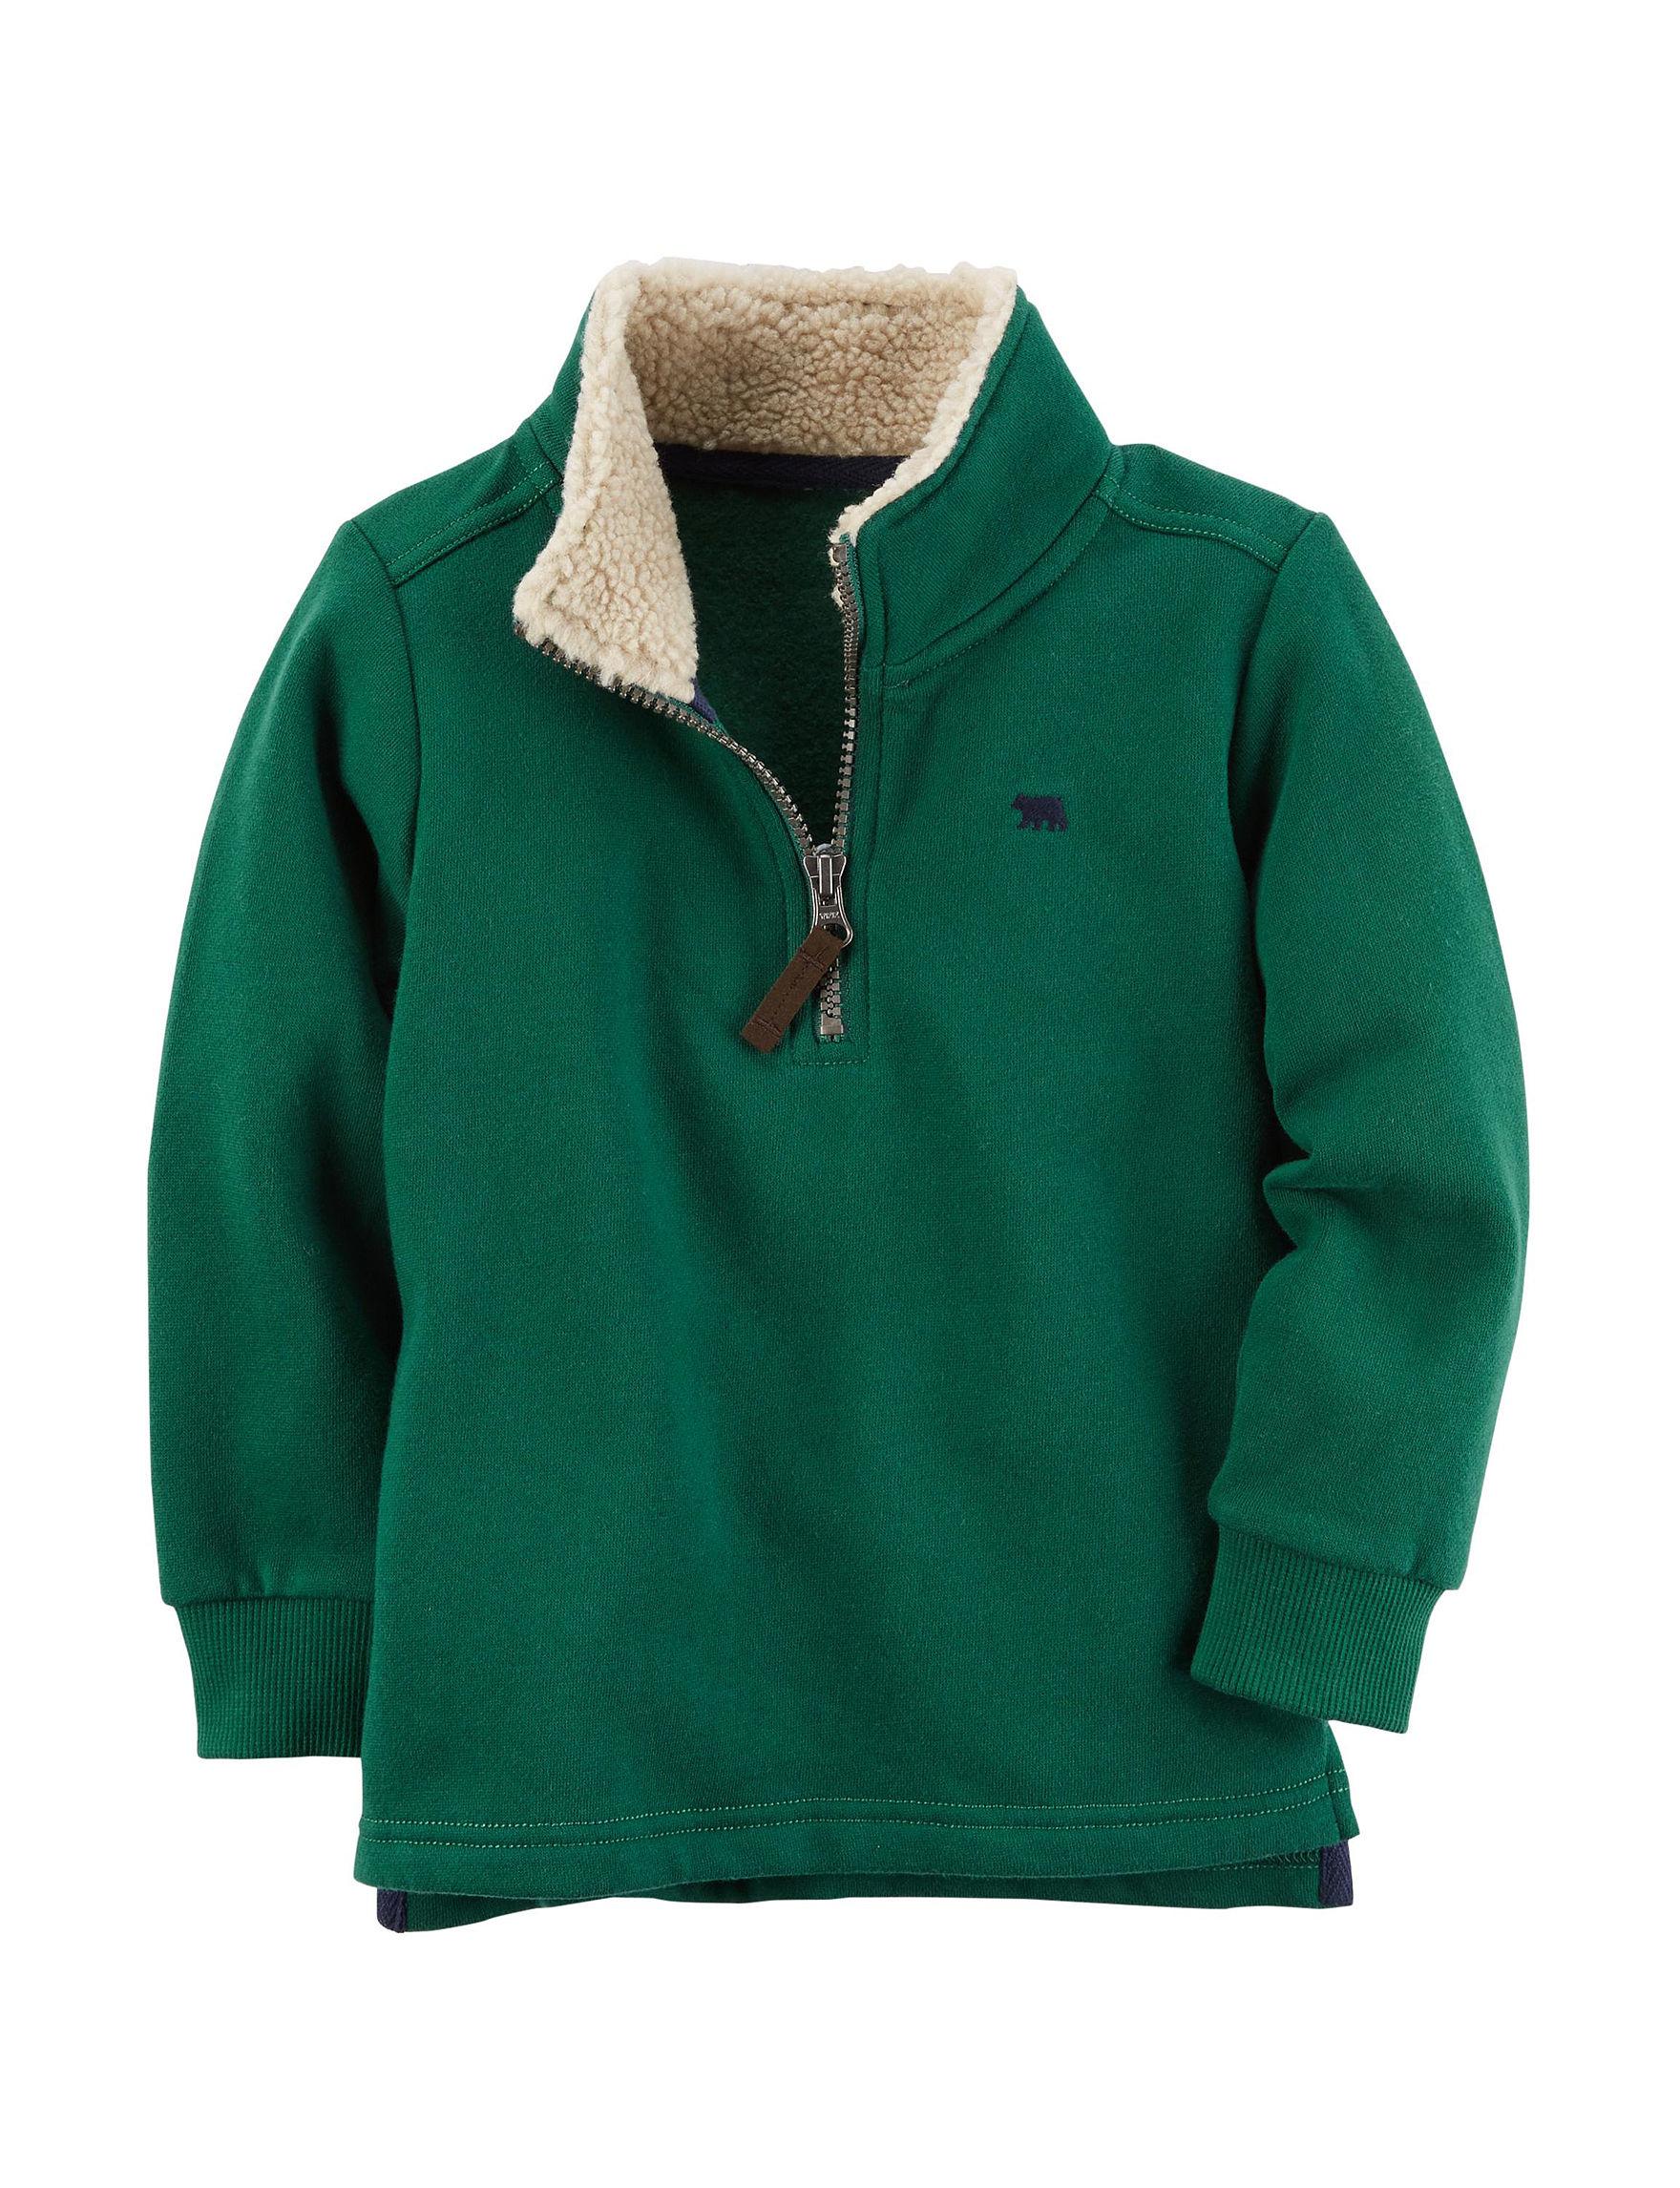 Carter's Green Casual Button Down Shirts